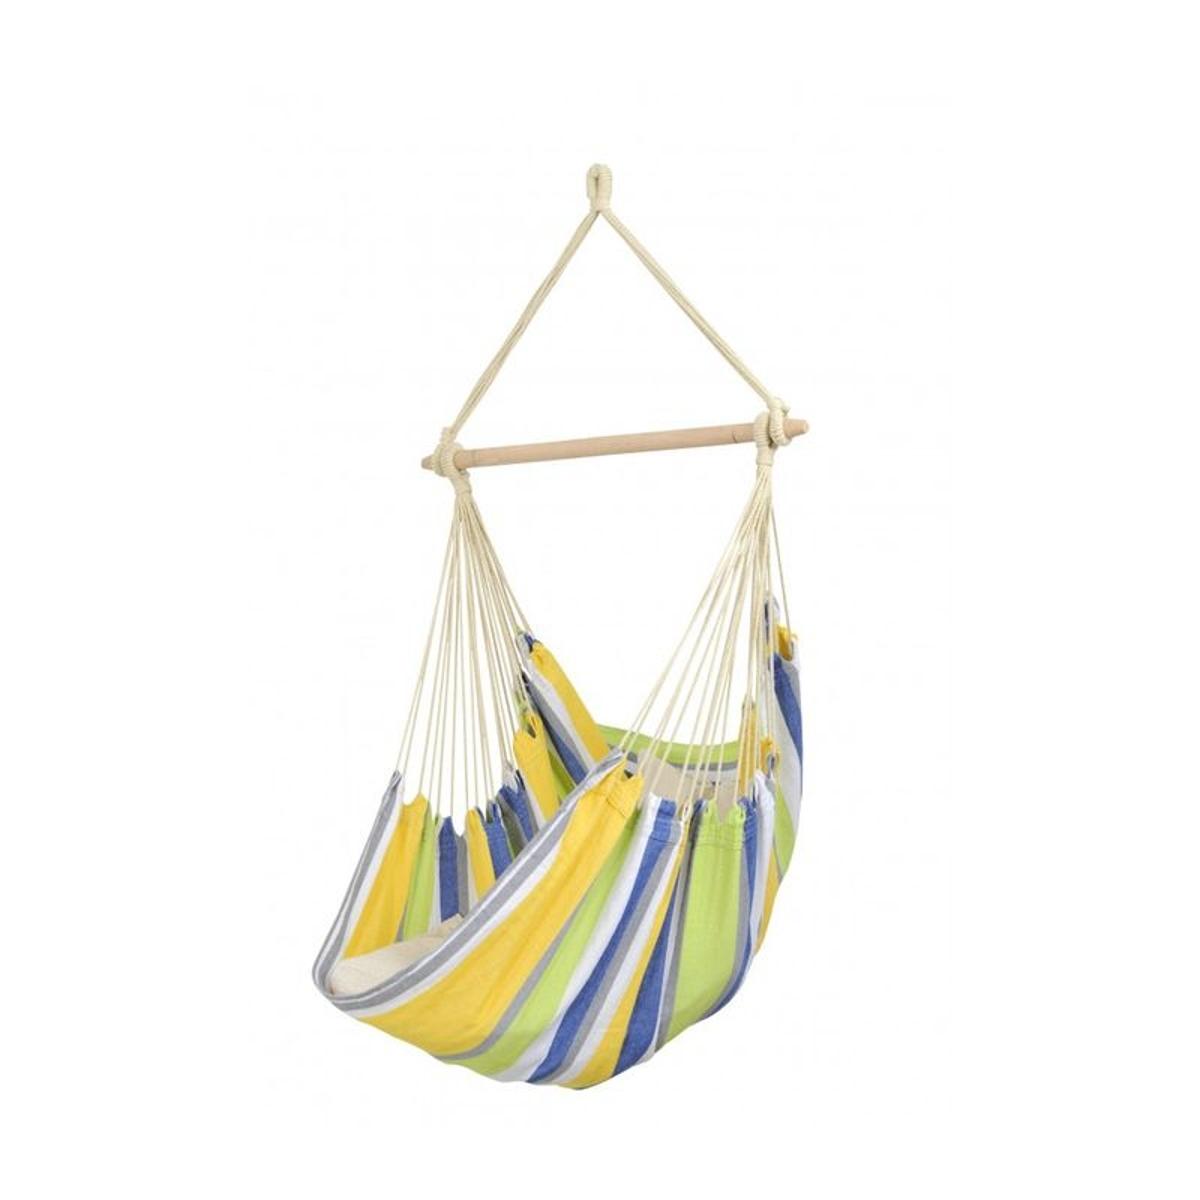 Relax Kolibri chaise hamac